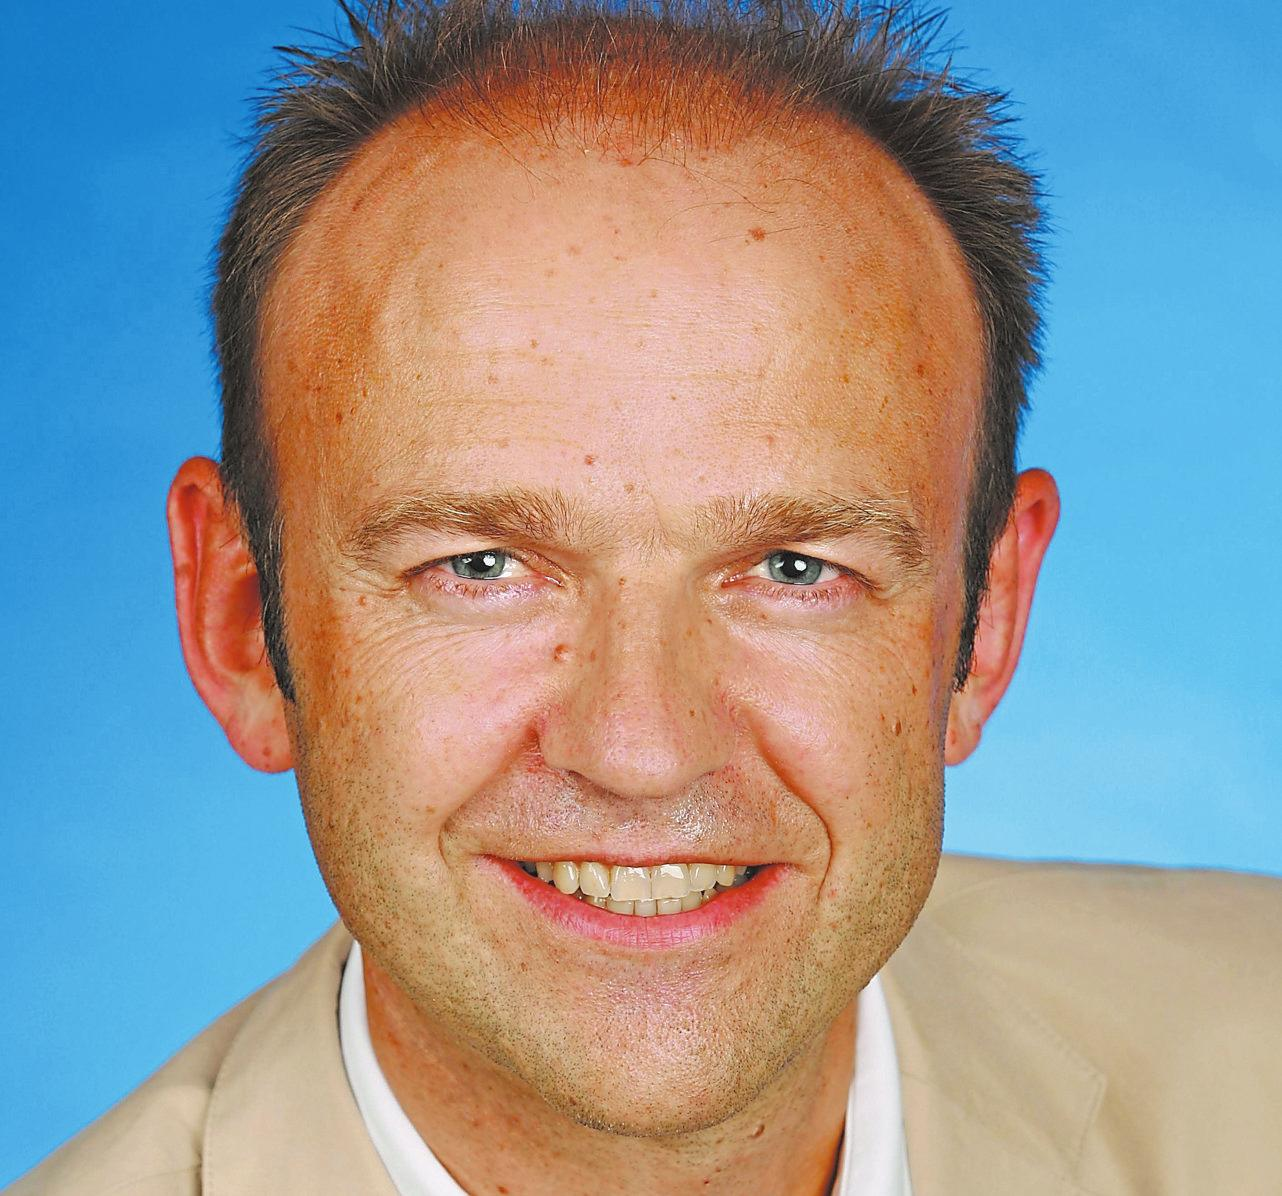 Dr. Norbert Wistorf referiert über diverse Herzerkrankungen. Foto:Josephs-Hospital Warendorf